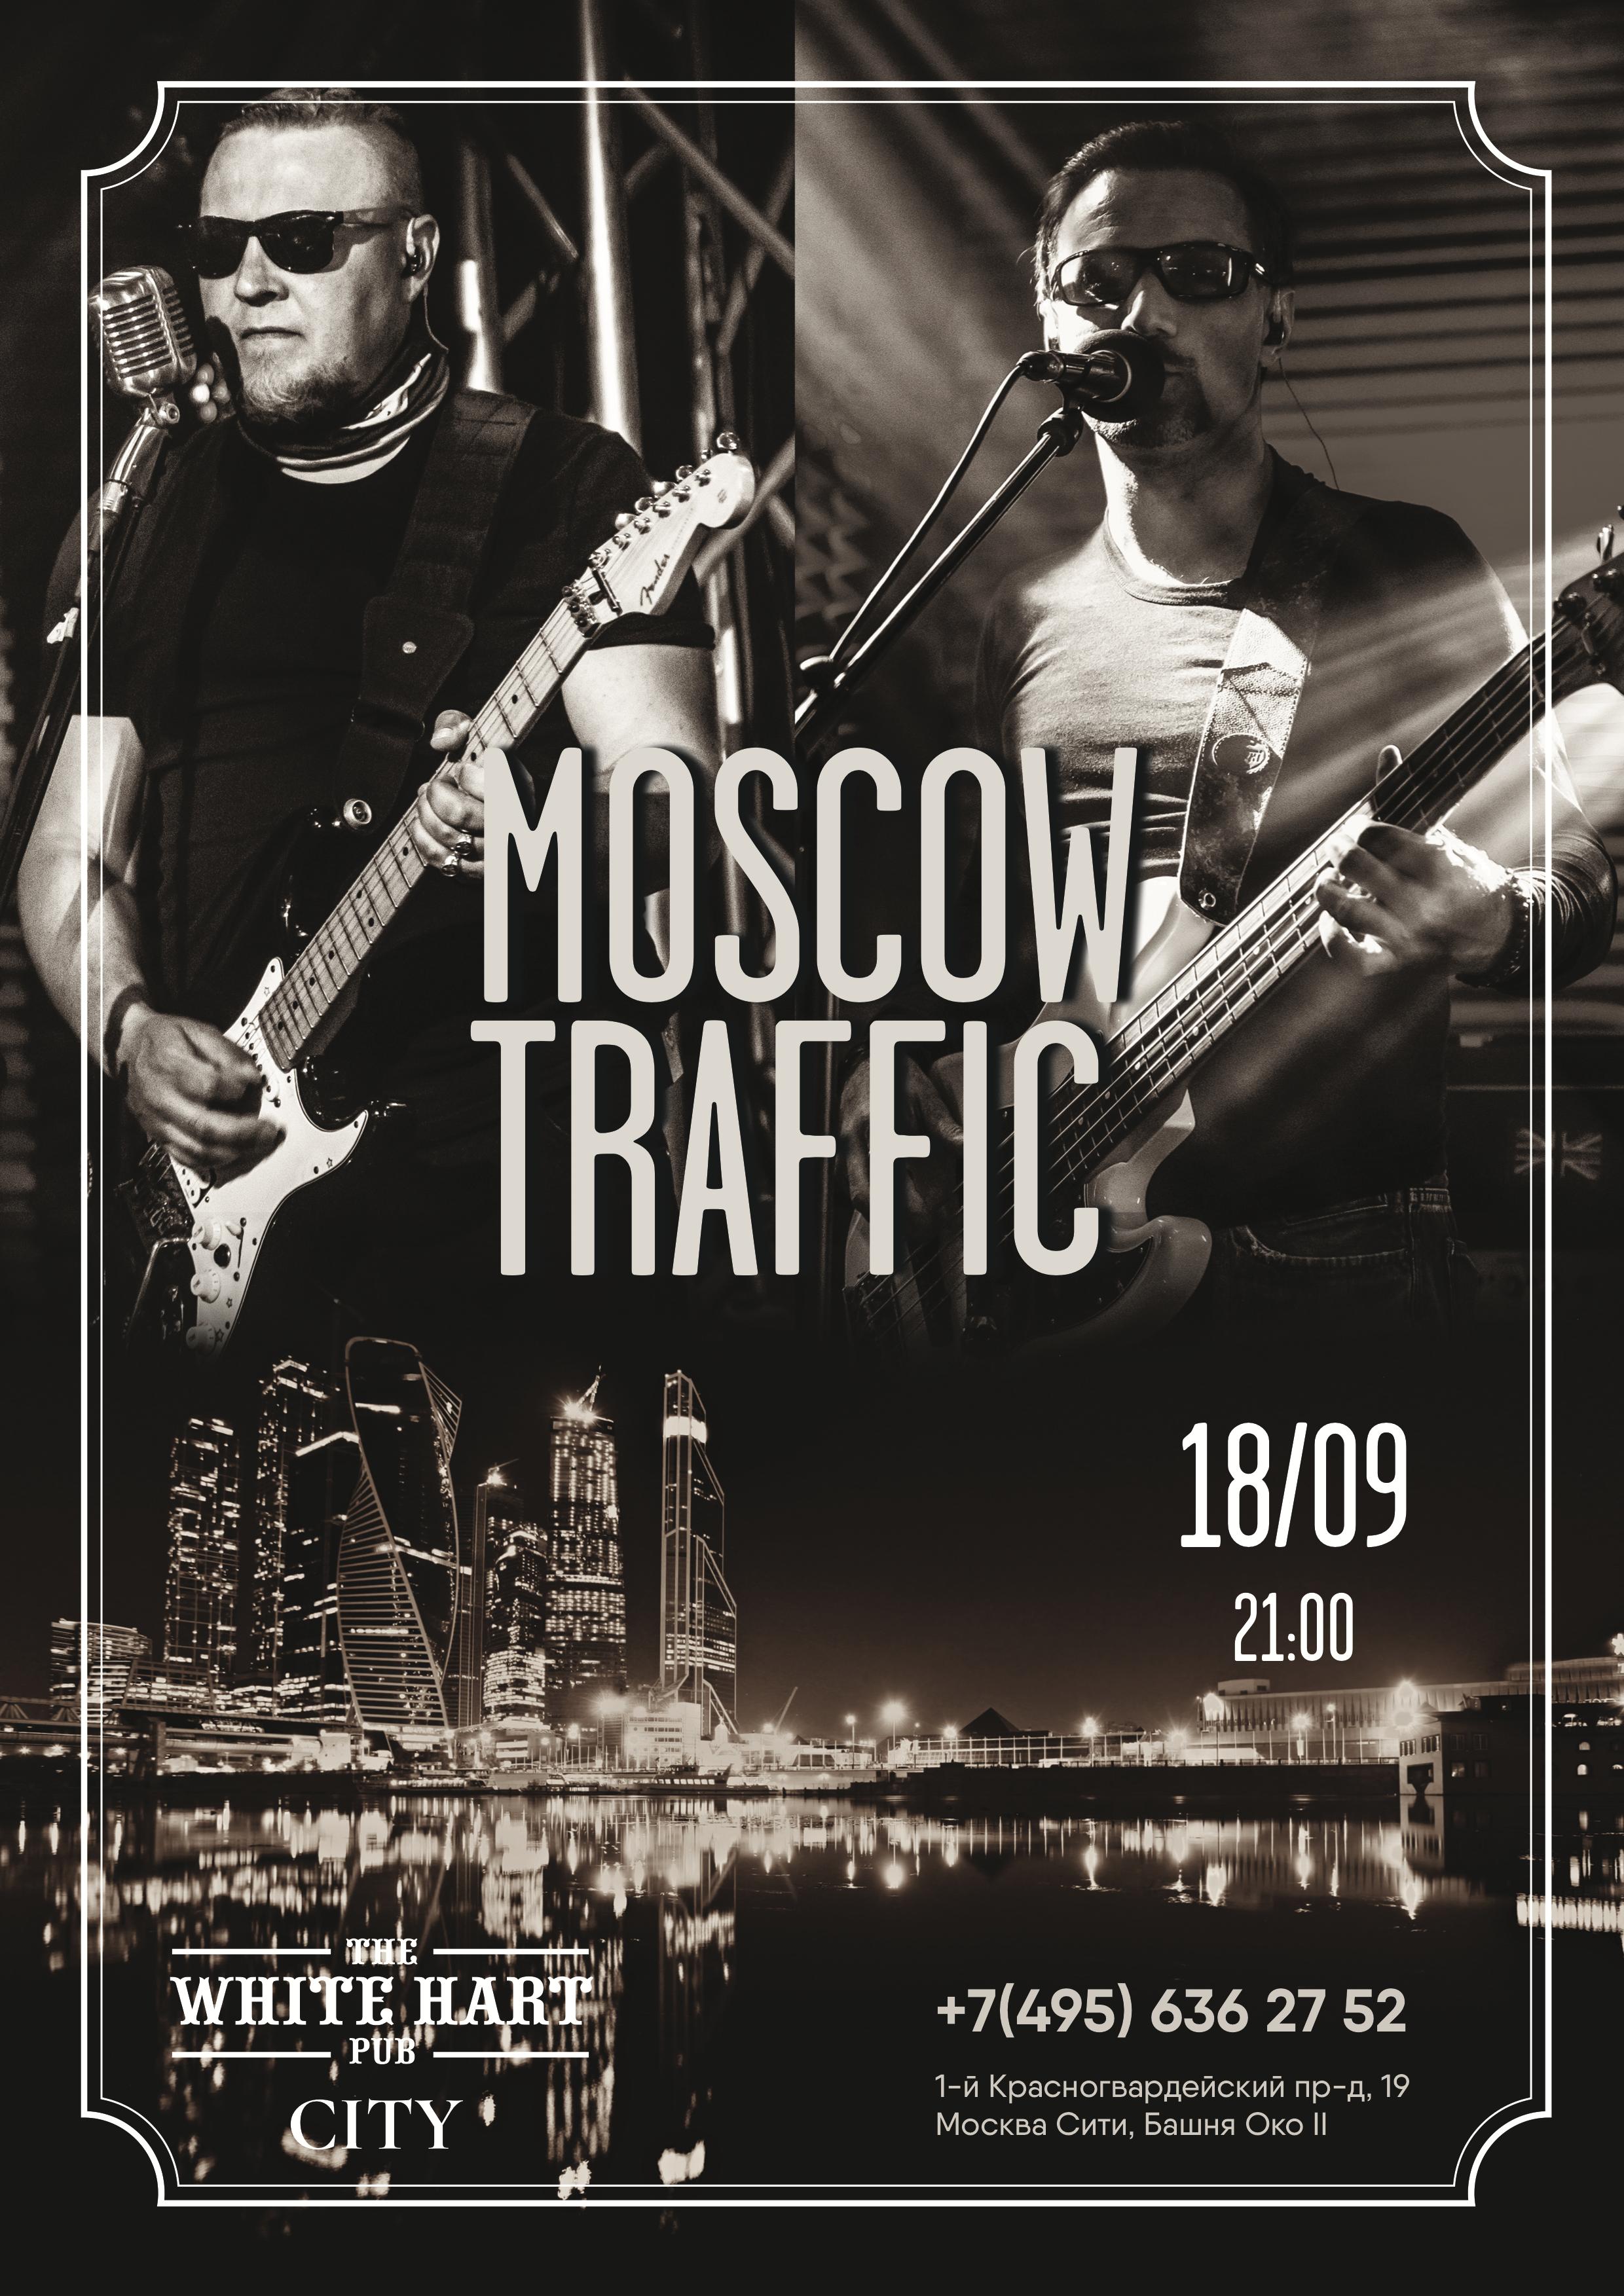 Афиша! 18 сентября — Кавер группа Moscow Traffic в White Hart Pub Moscow City